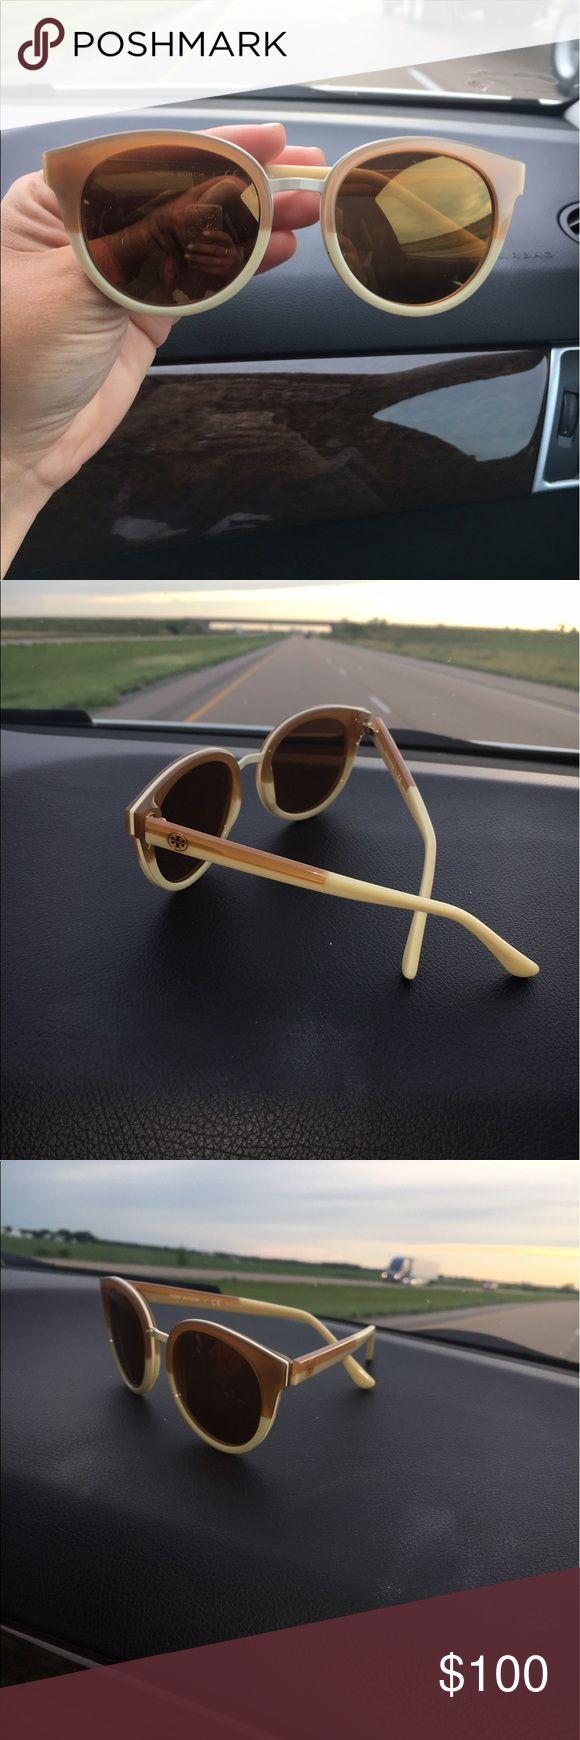 Tory Burch Panama Sunglasses Tory Burch Panama Sunglasses. Style number 7062. As seen on Beyoncé! Tory Burch Accessories Sunglasses